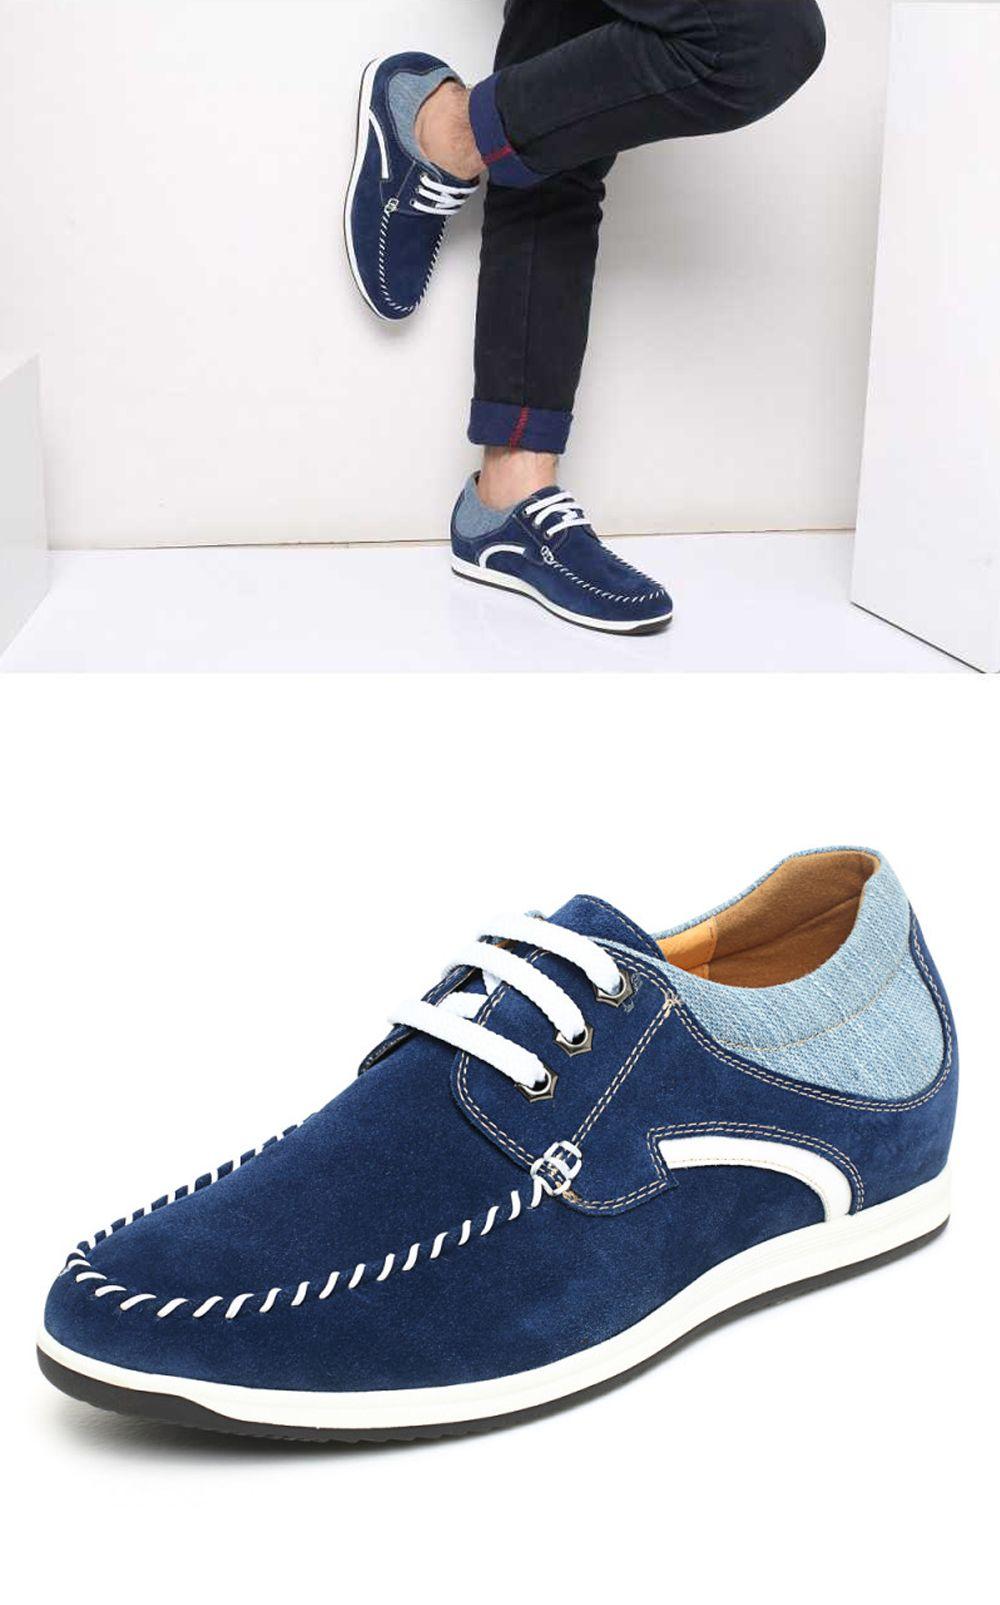 Meskie Buty Niebieskie Zamszowe Skorzane Podwyzszajace 6 Cm Faretti Lorenzo Codzienne Sneakersy Sneakers Shoes Tretorn Sneaker